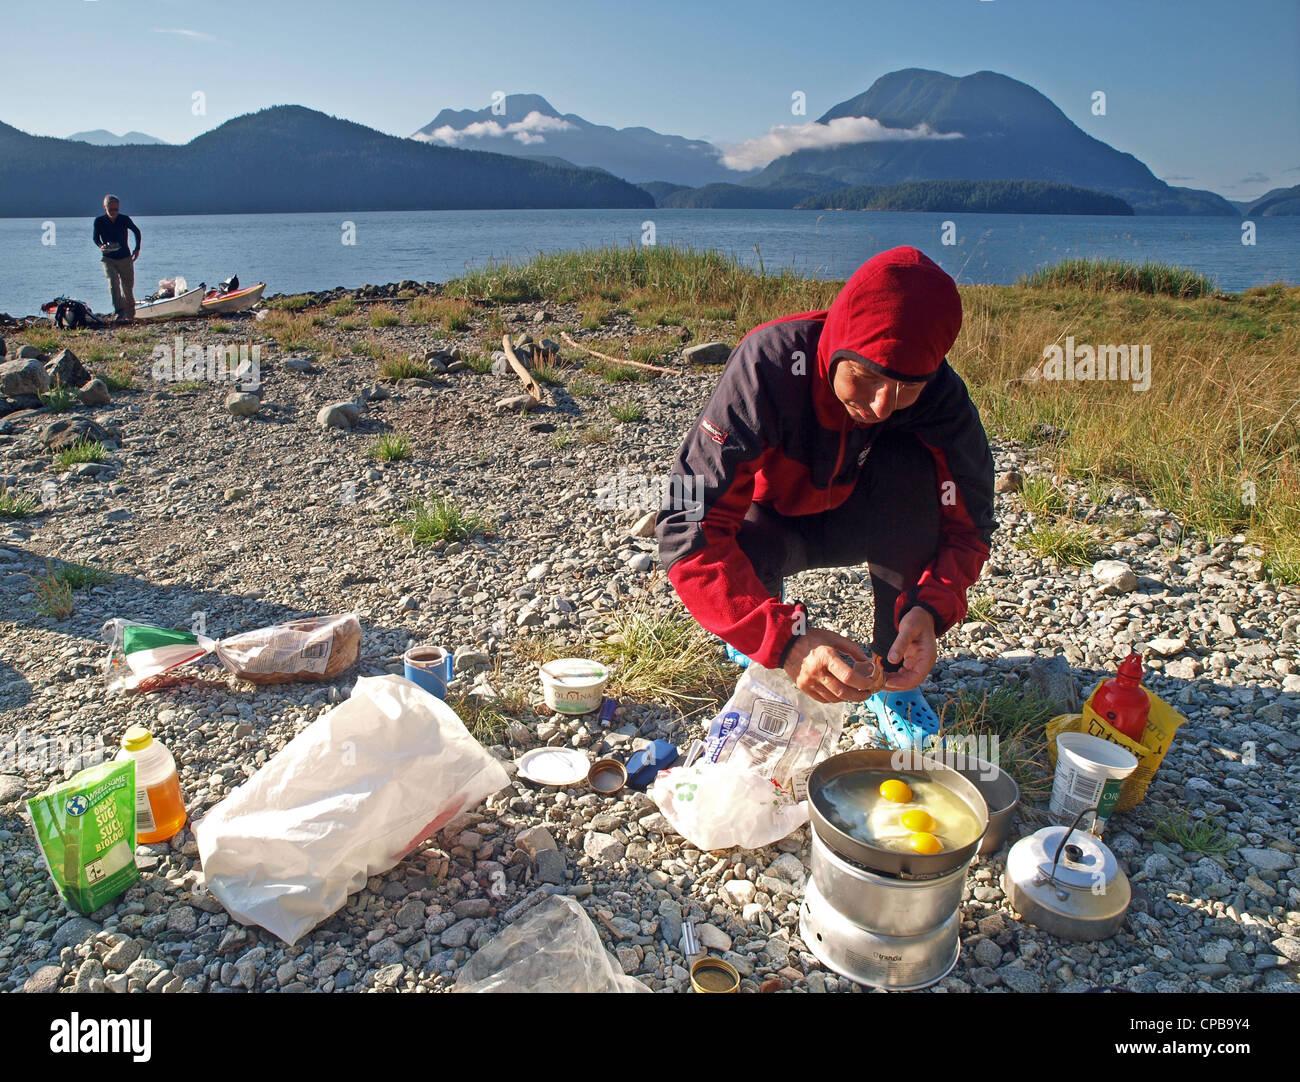 Camp cooking, Toba Inlet, BC, during a sea kayak expedition, Desolation Sound, British Columbia, Canada - Stock Image